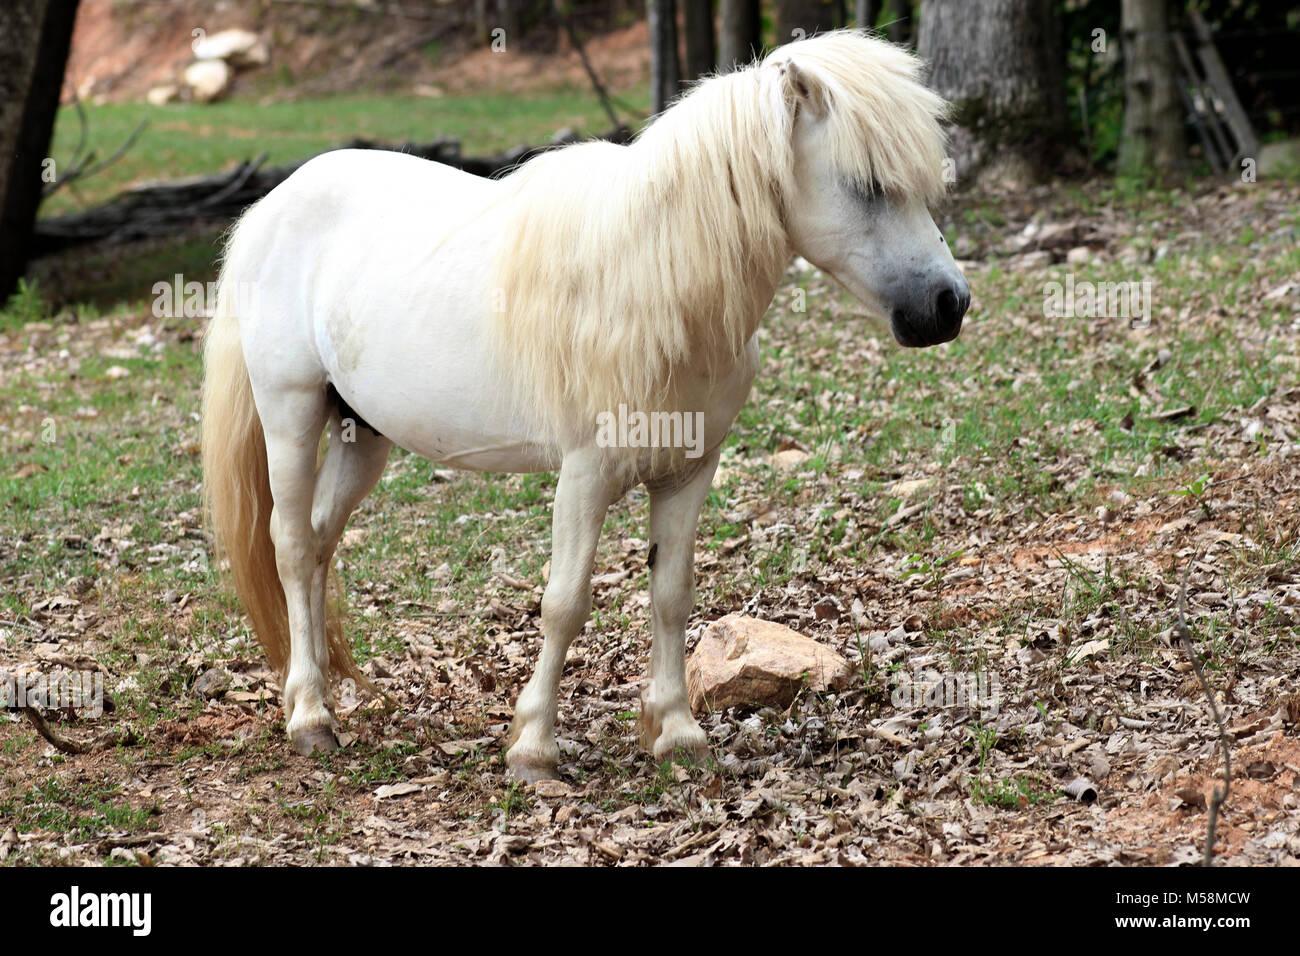 Cute white pony - Stock Image